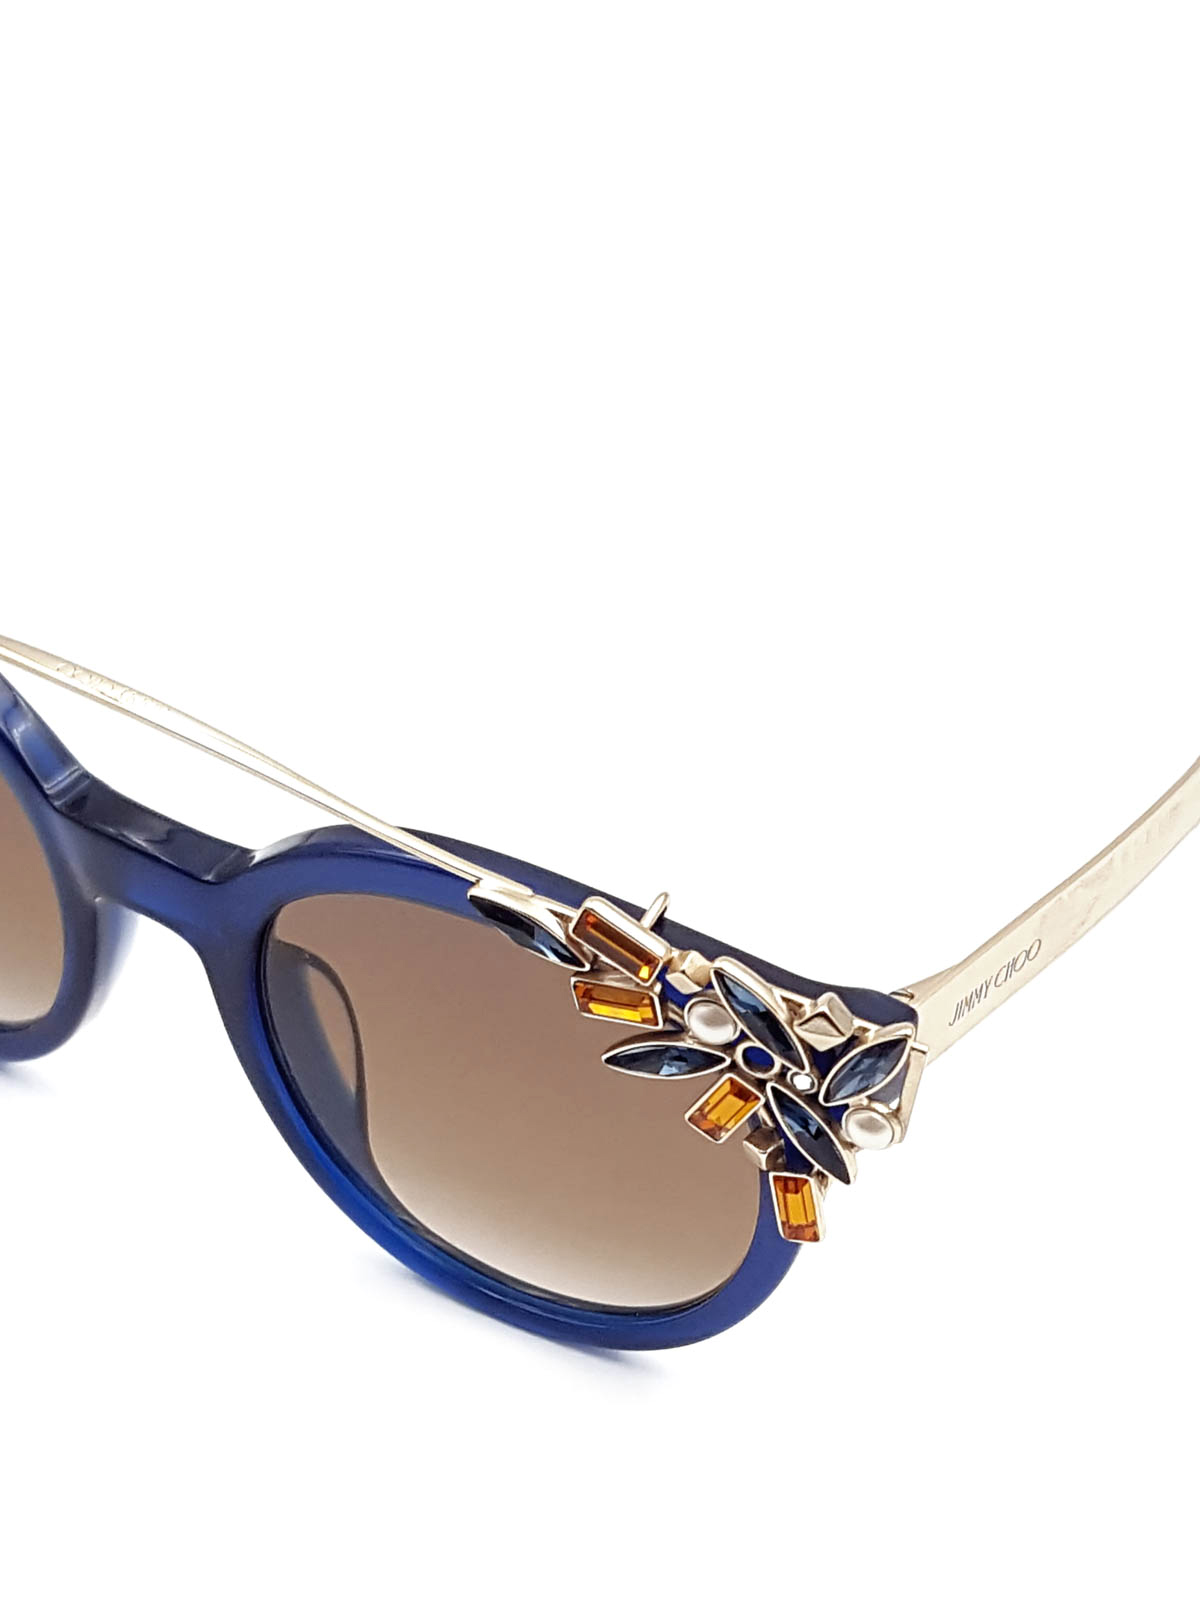 6fd0eb287f7cb Jimmy Choo - Vivy sunglasses - sunglasses - VIVYS1UN